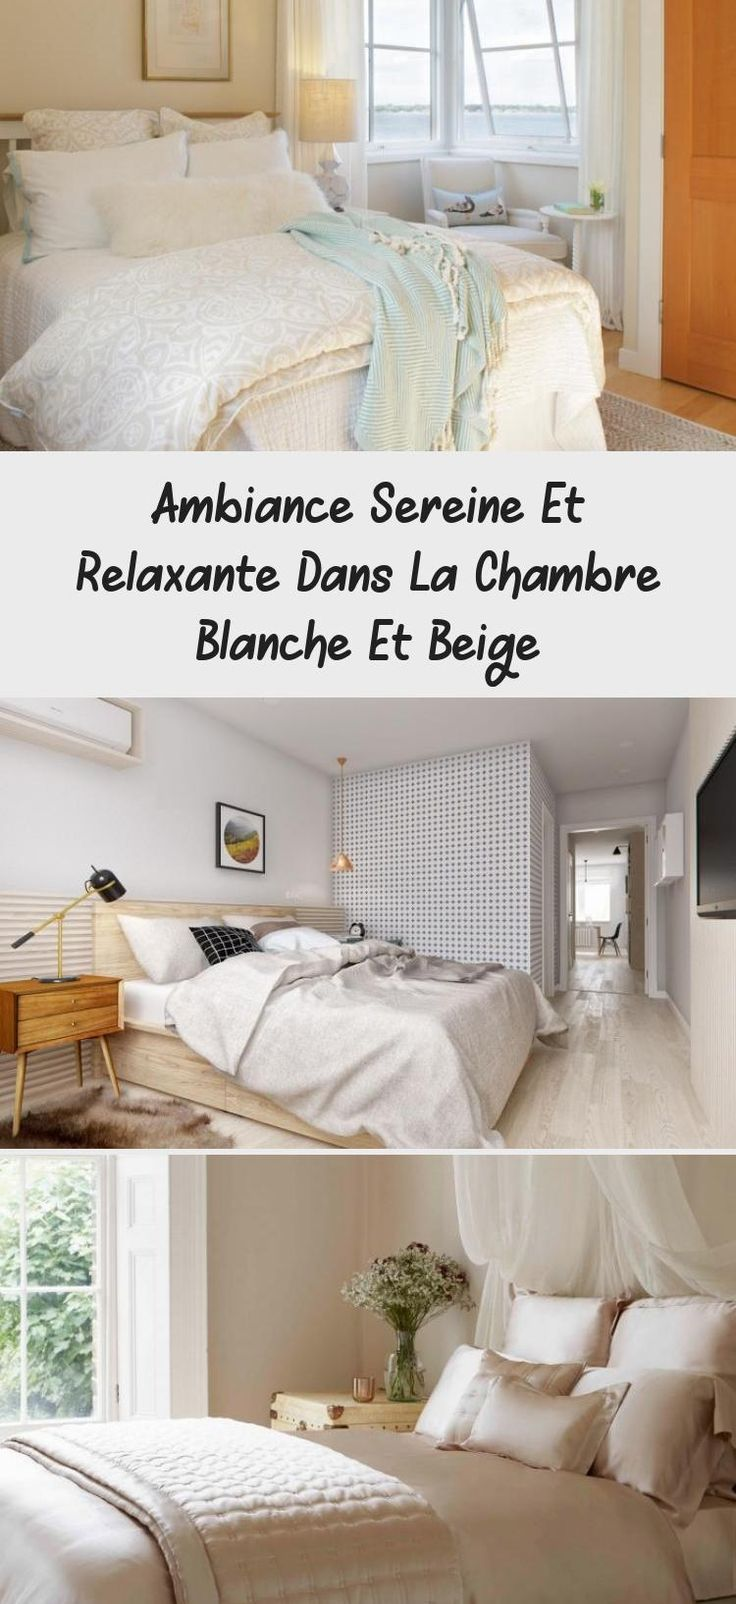 Chambre Ado Boheme Chic décoration #chambre #style décoration de chambre ado en